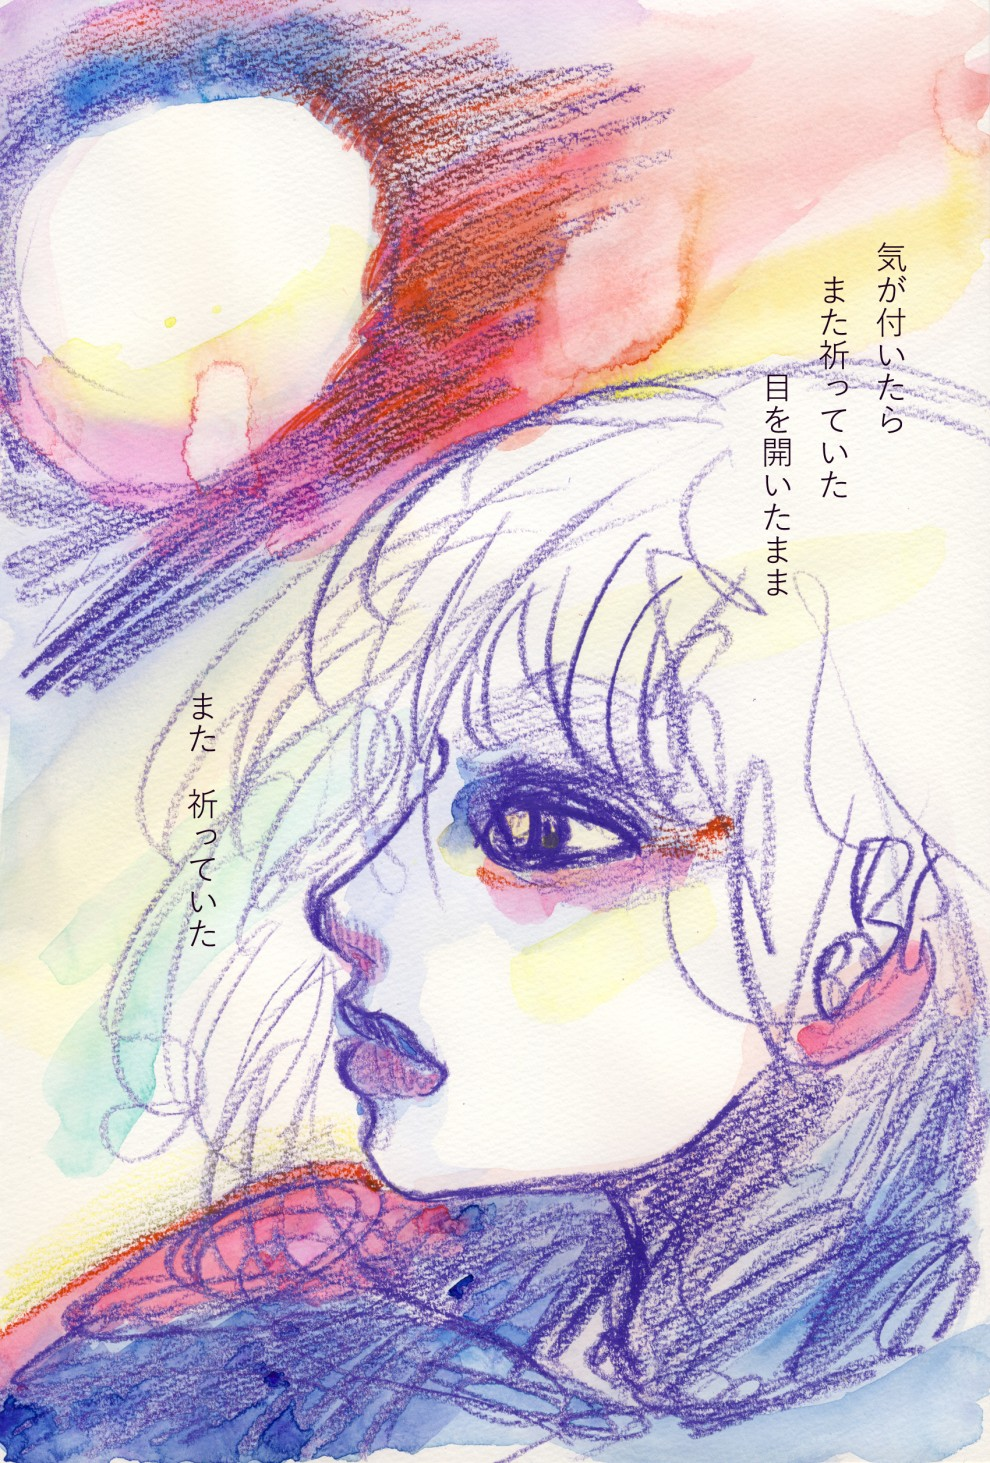 http://ahito.com/comic/ehon/voice/img/2017/20171123/04.jpg